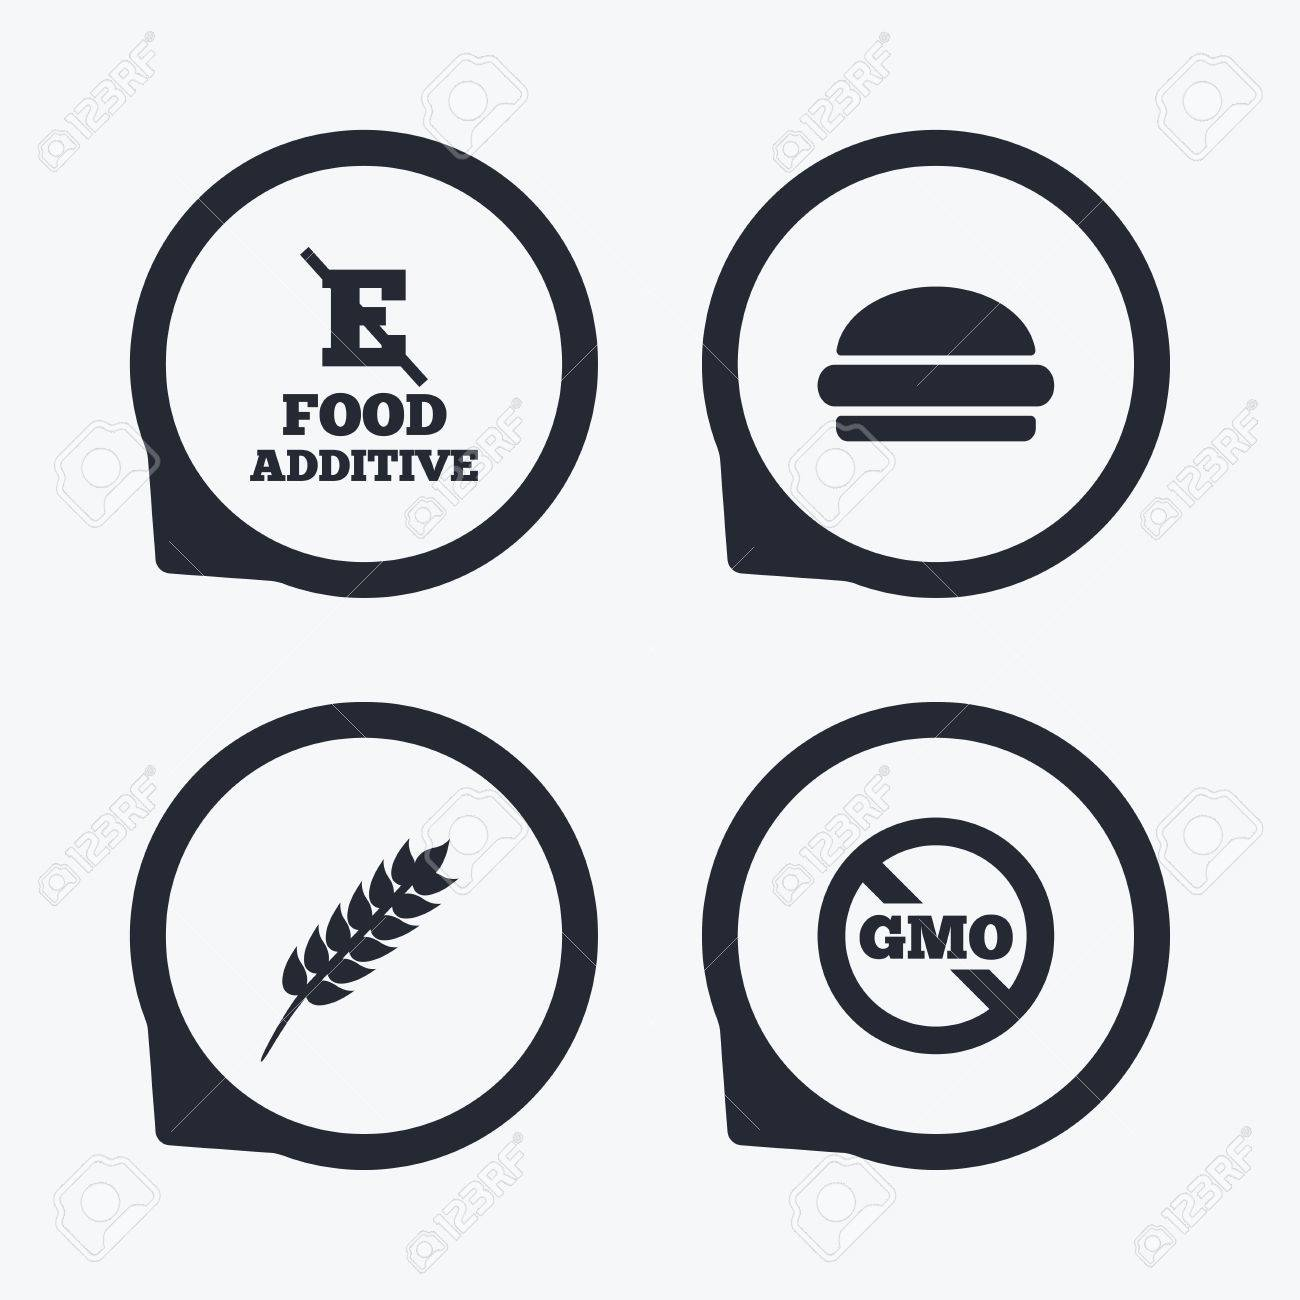 Food Additive Icon Hamburger Fast Food Sign Gluten Free And